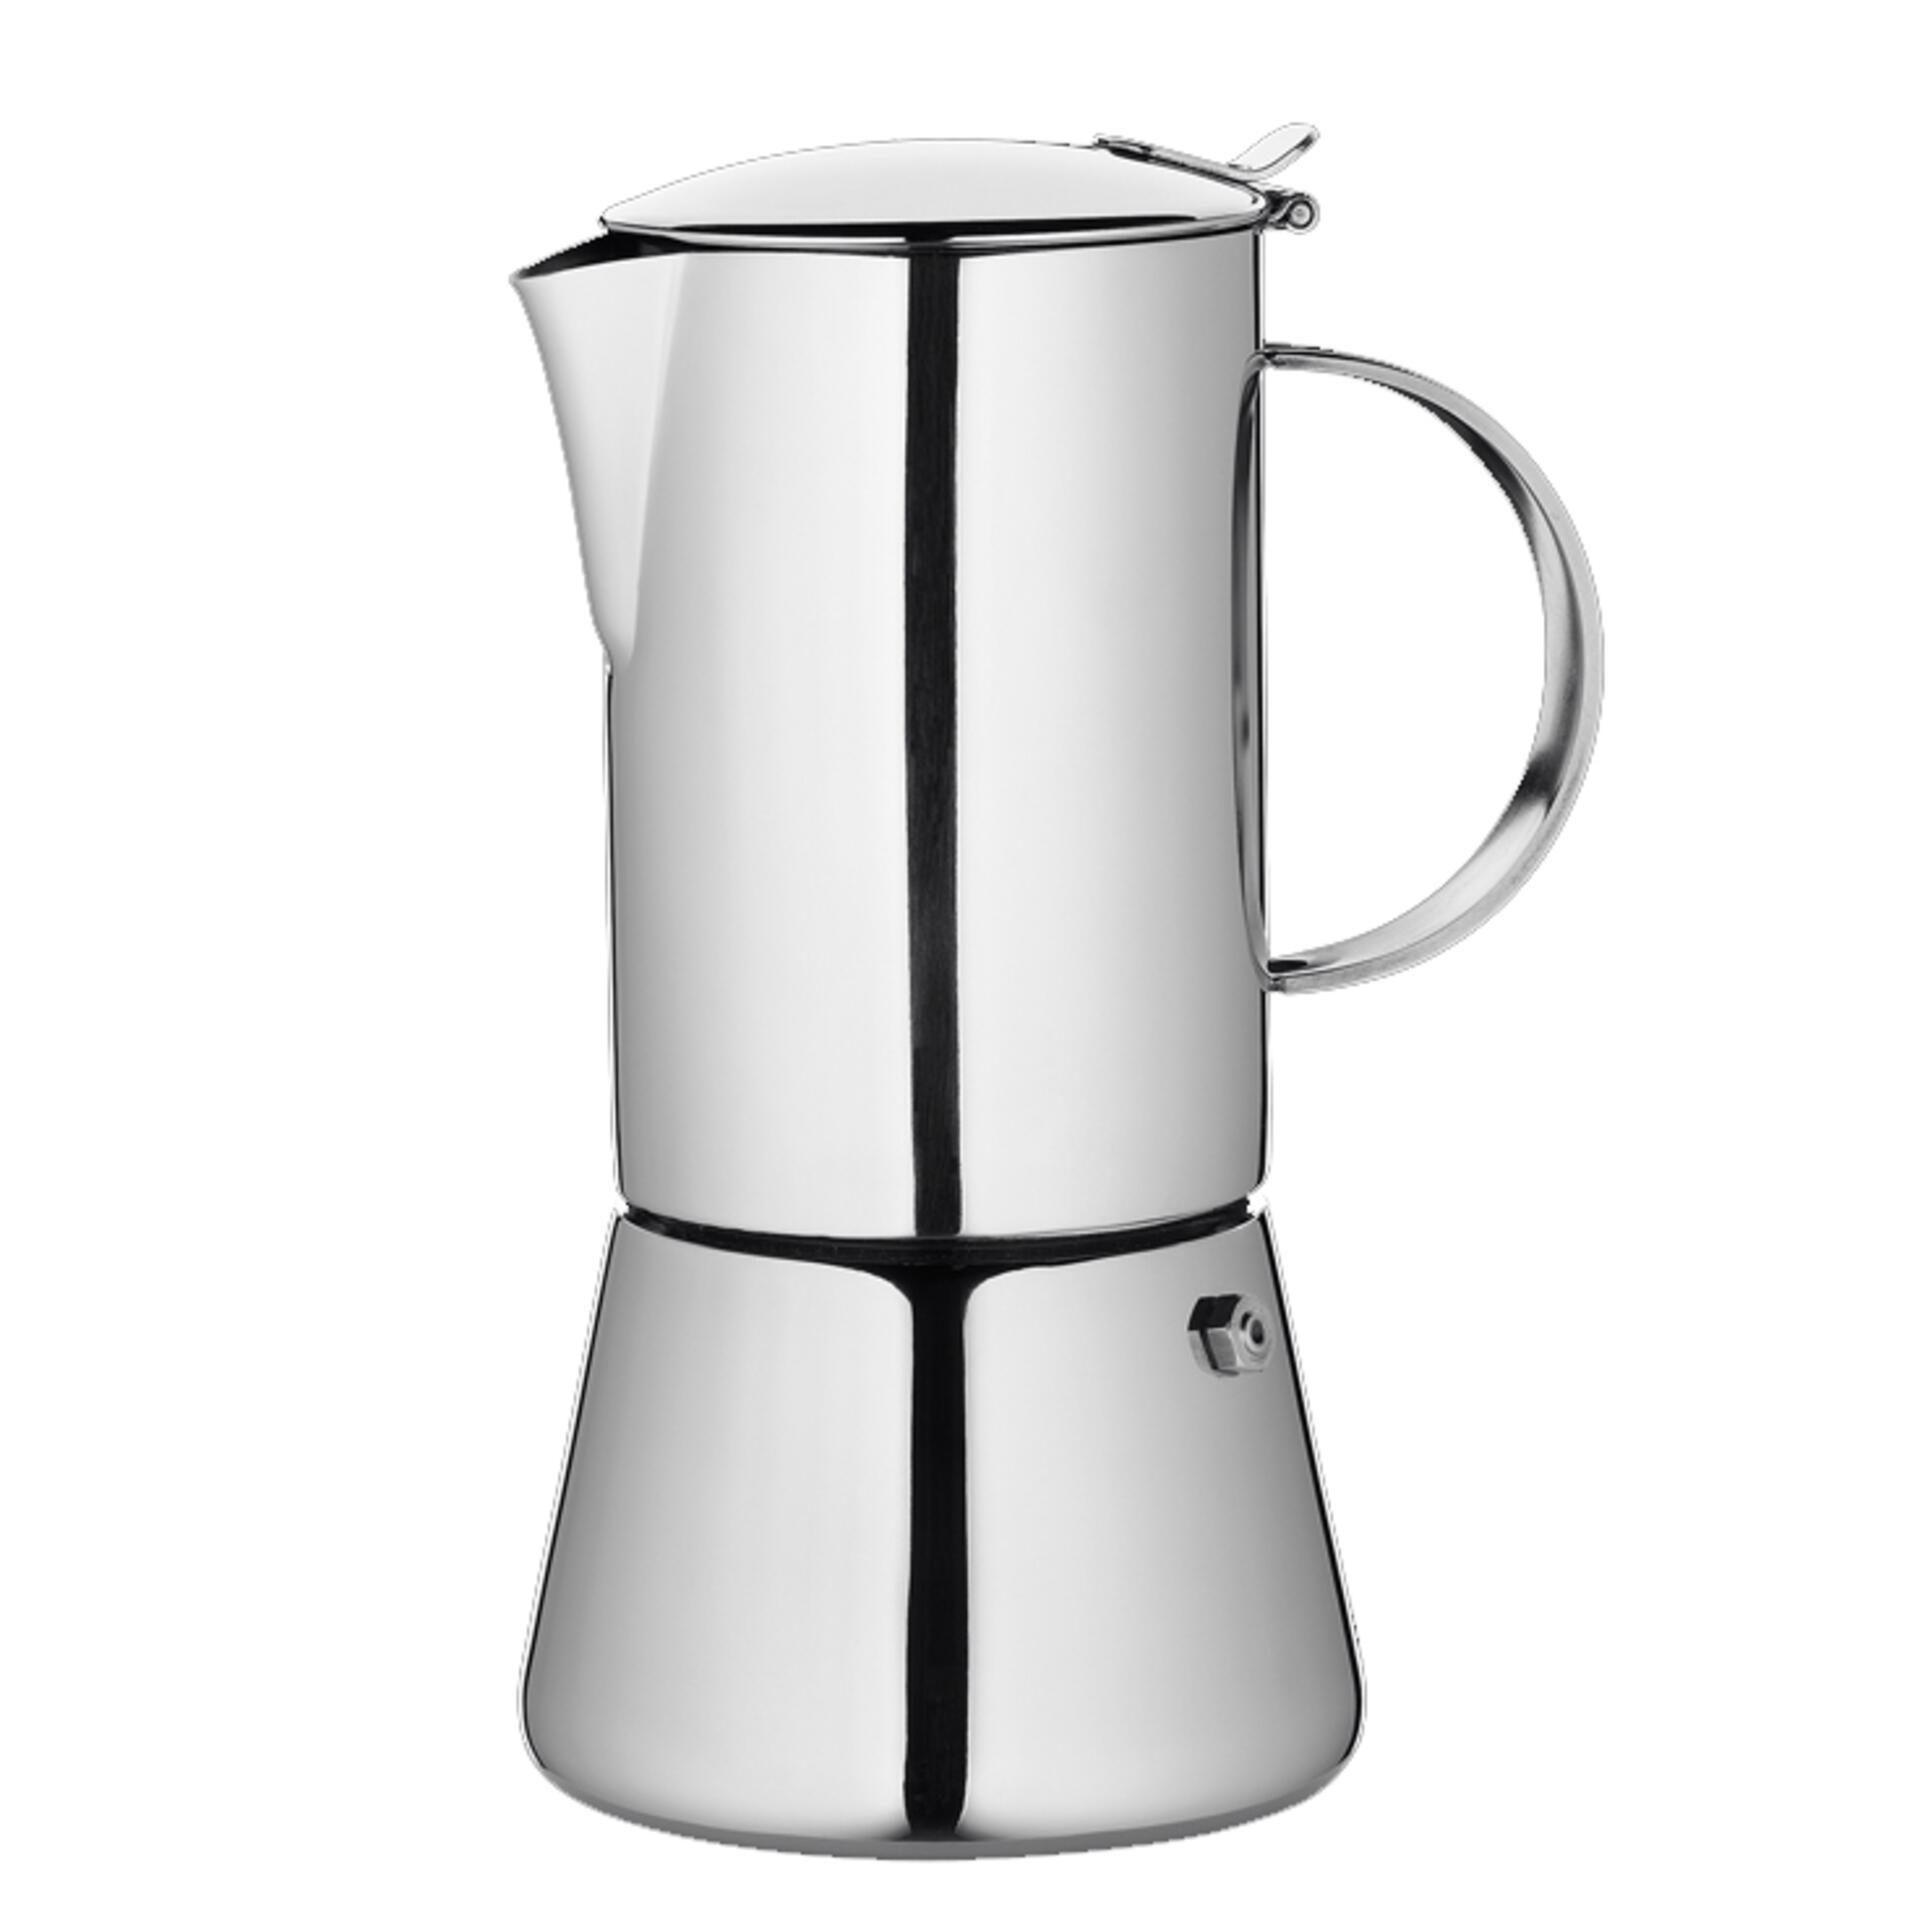 Cilio Espressokocher Edelstahl Aida 6 Tassen